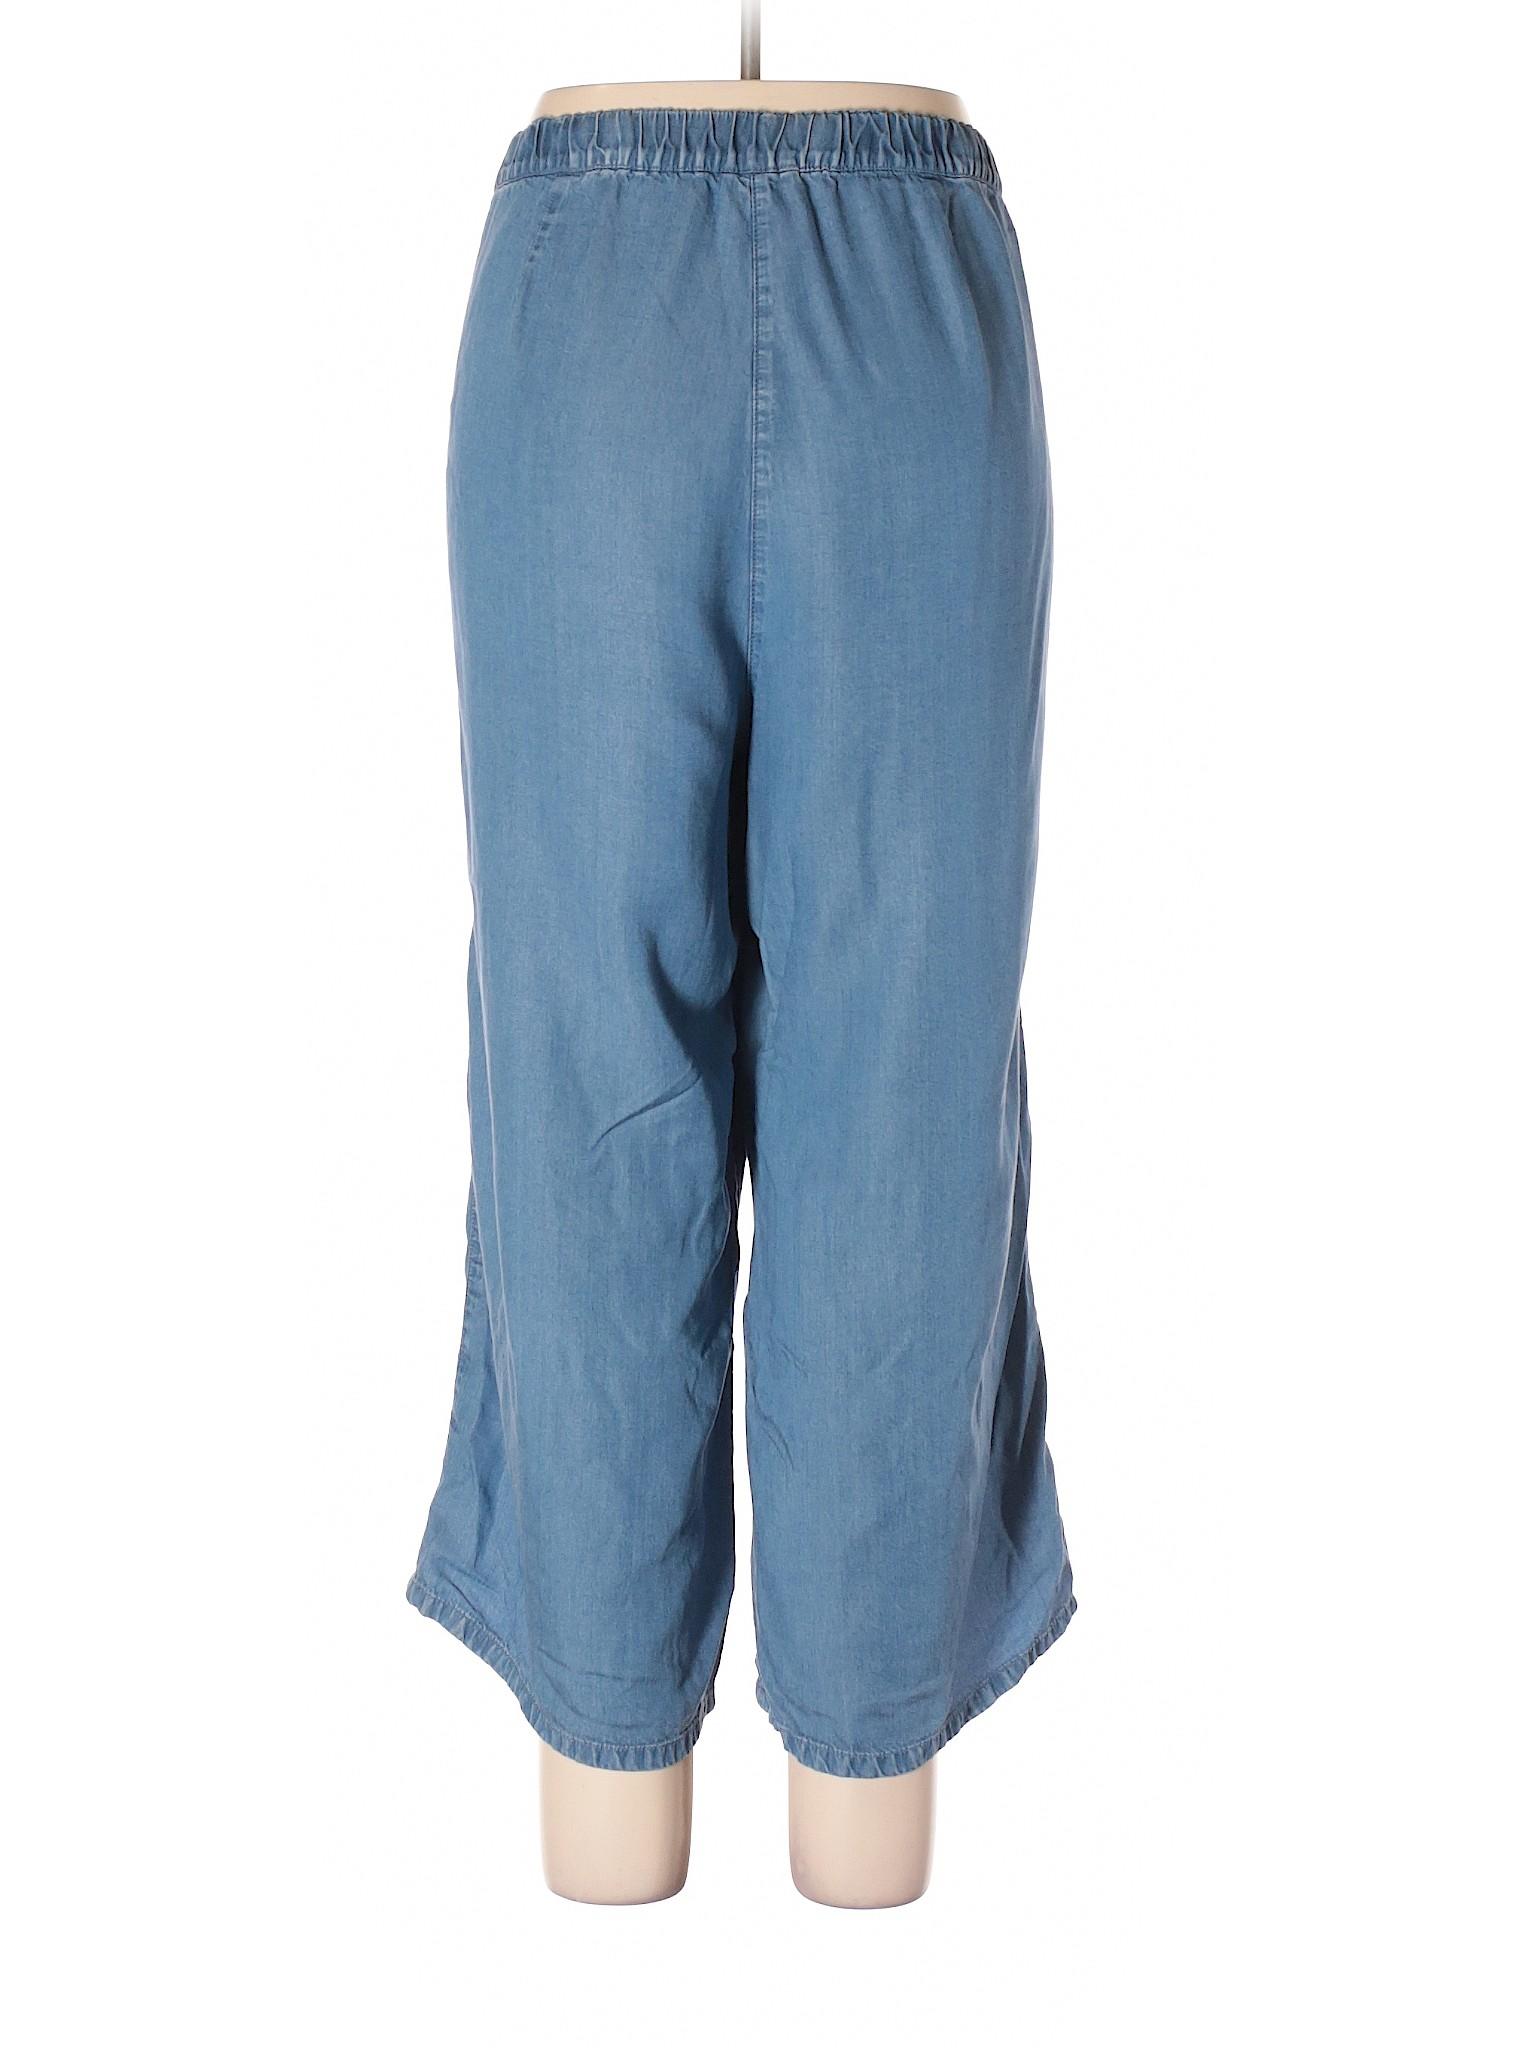 jill leisure J Pants Boutique Casual Egpqvw